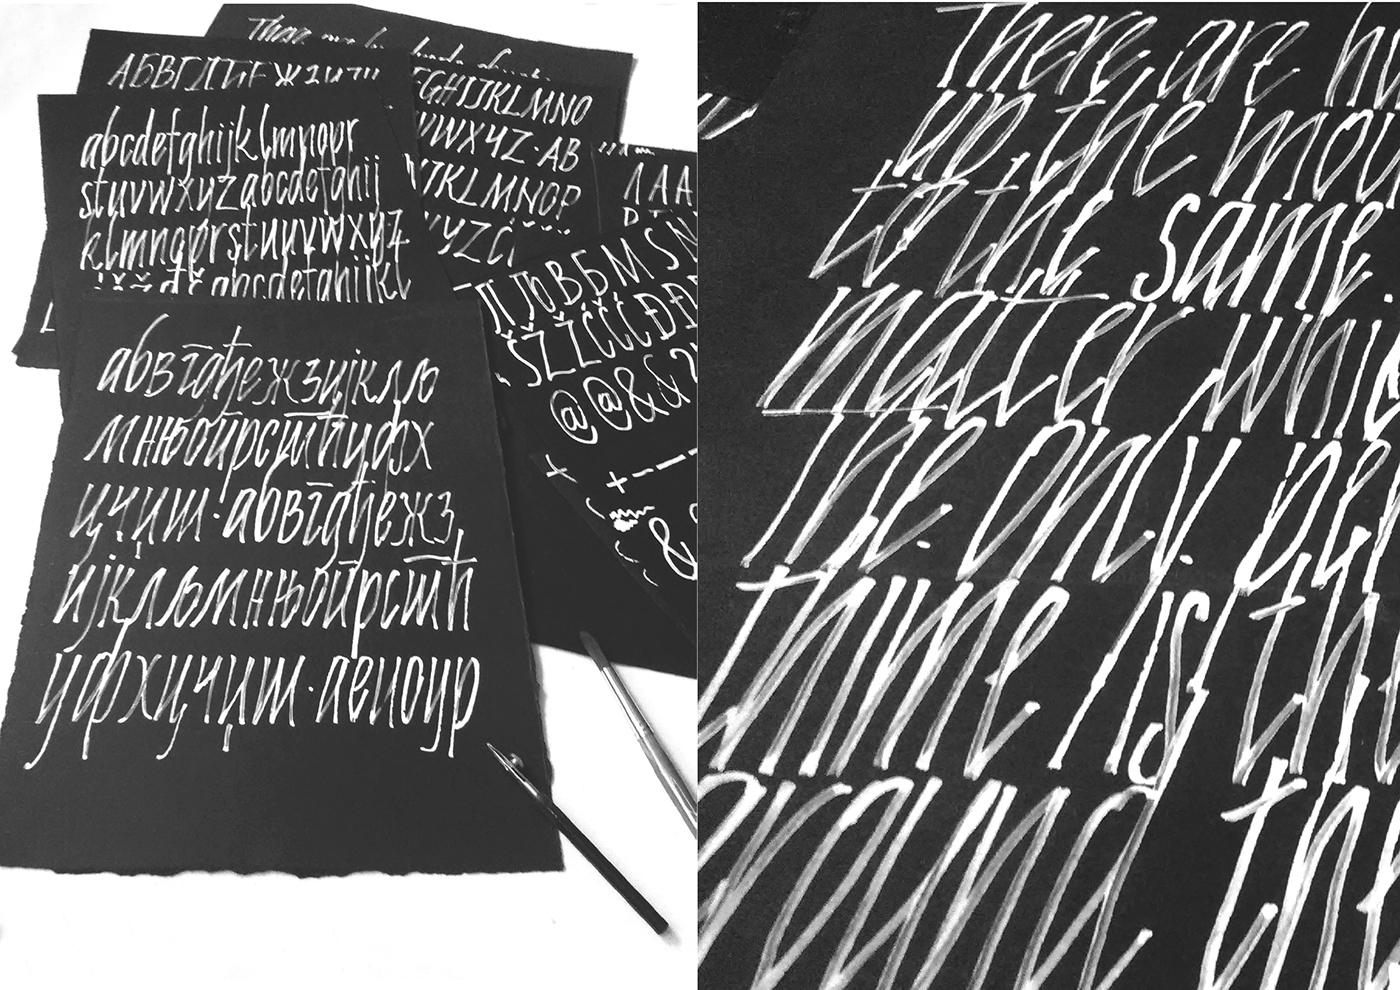 jasminum-handwriting-font-6